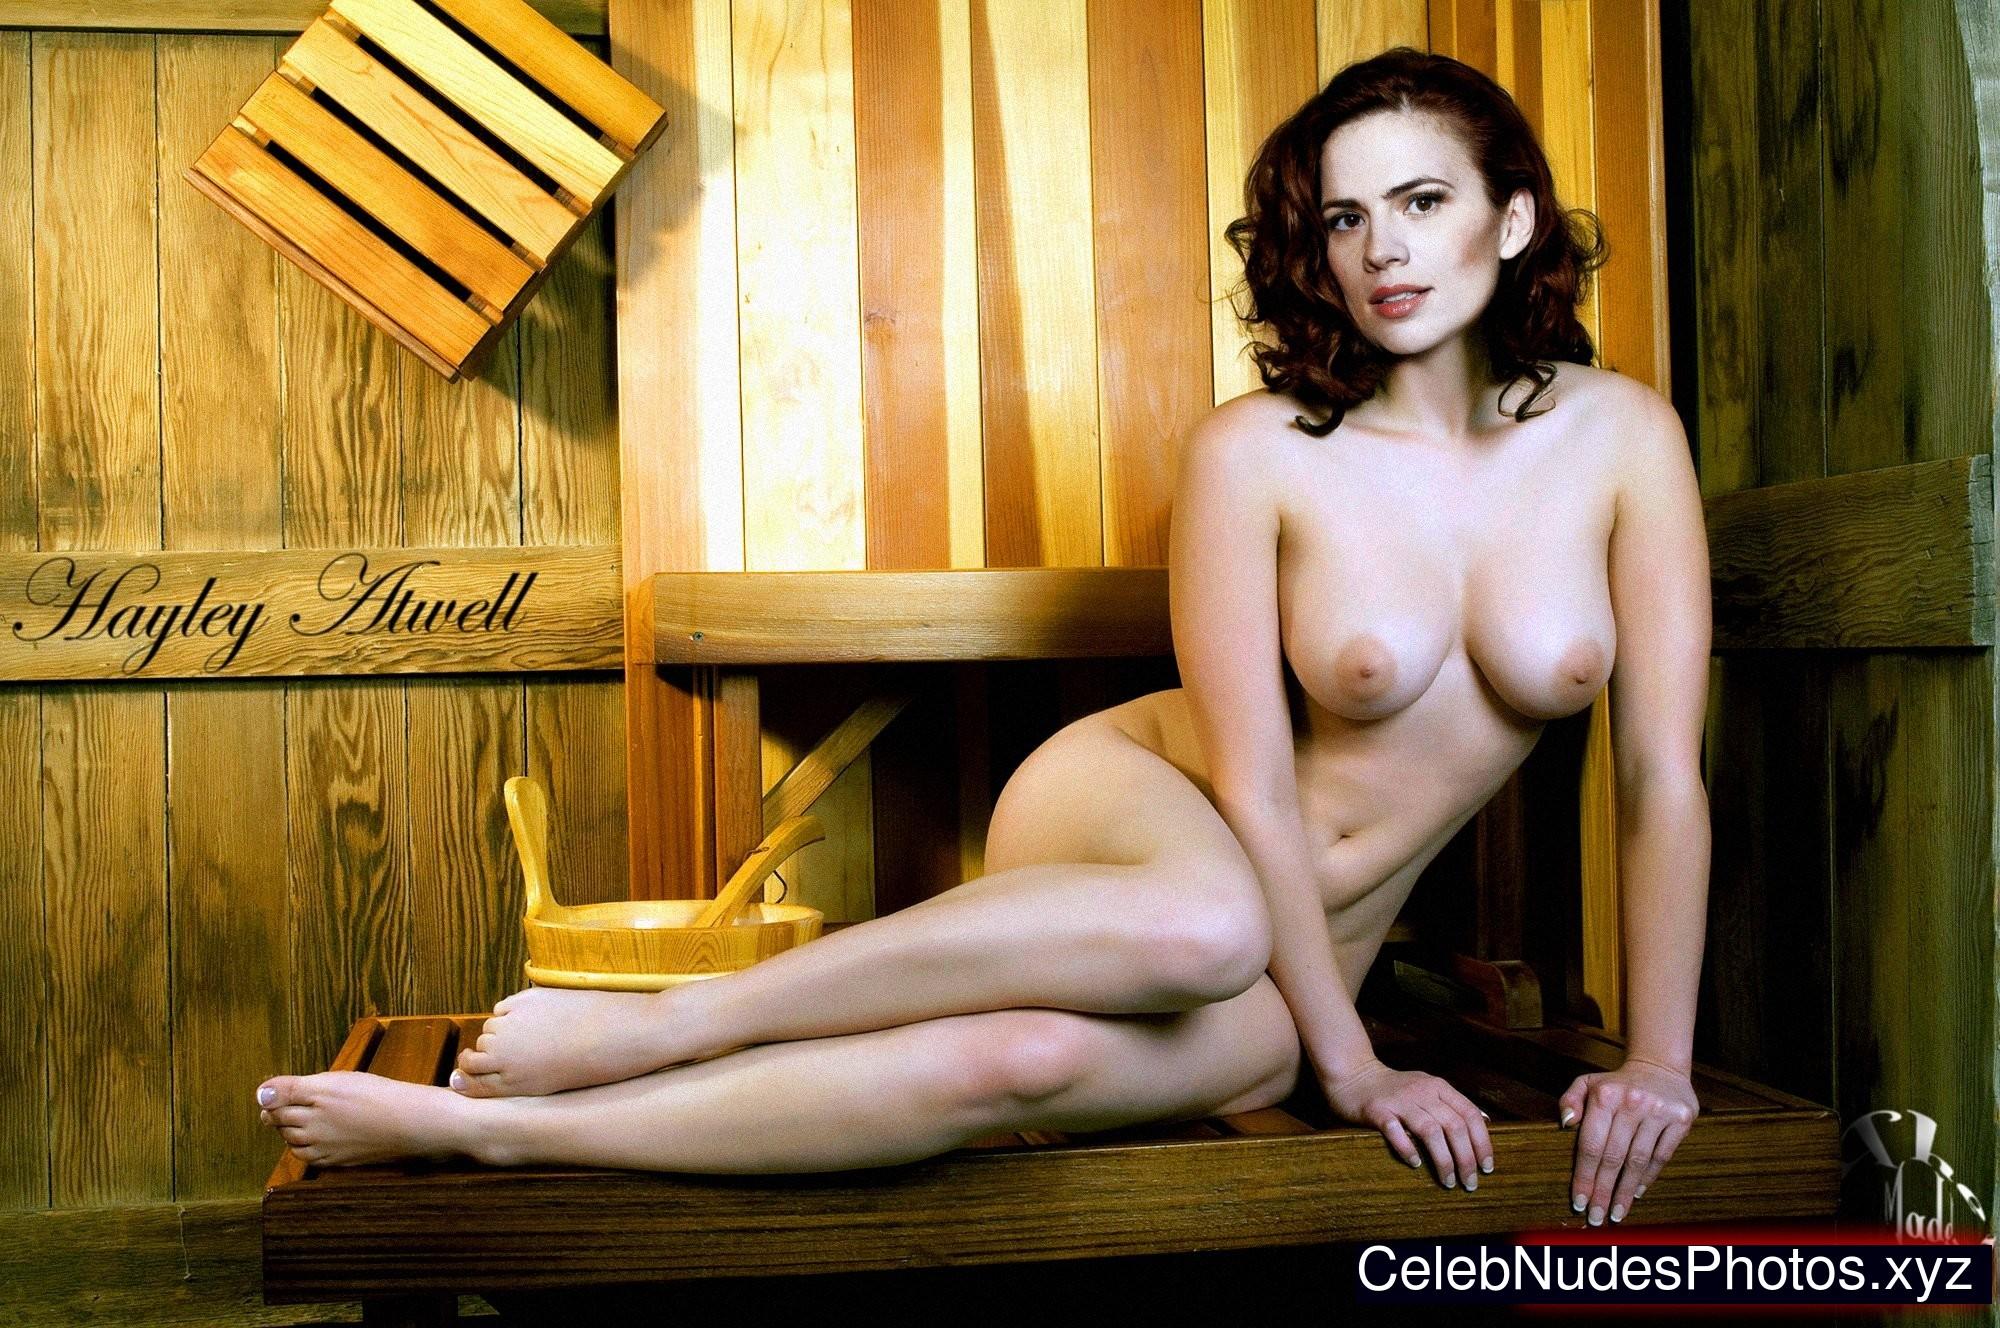 hayley atwell nude pics